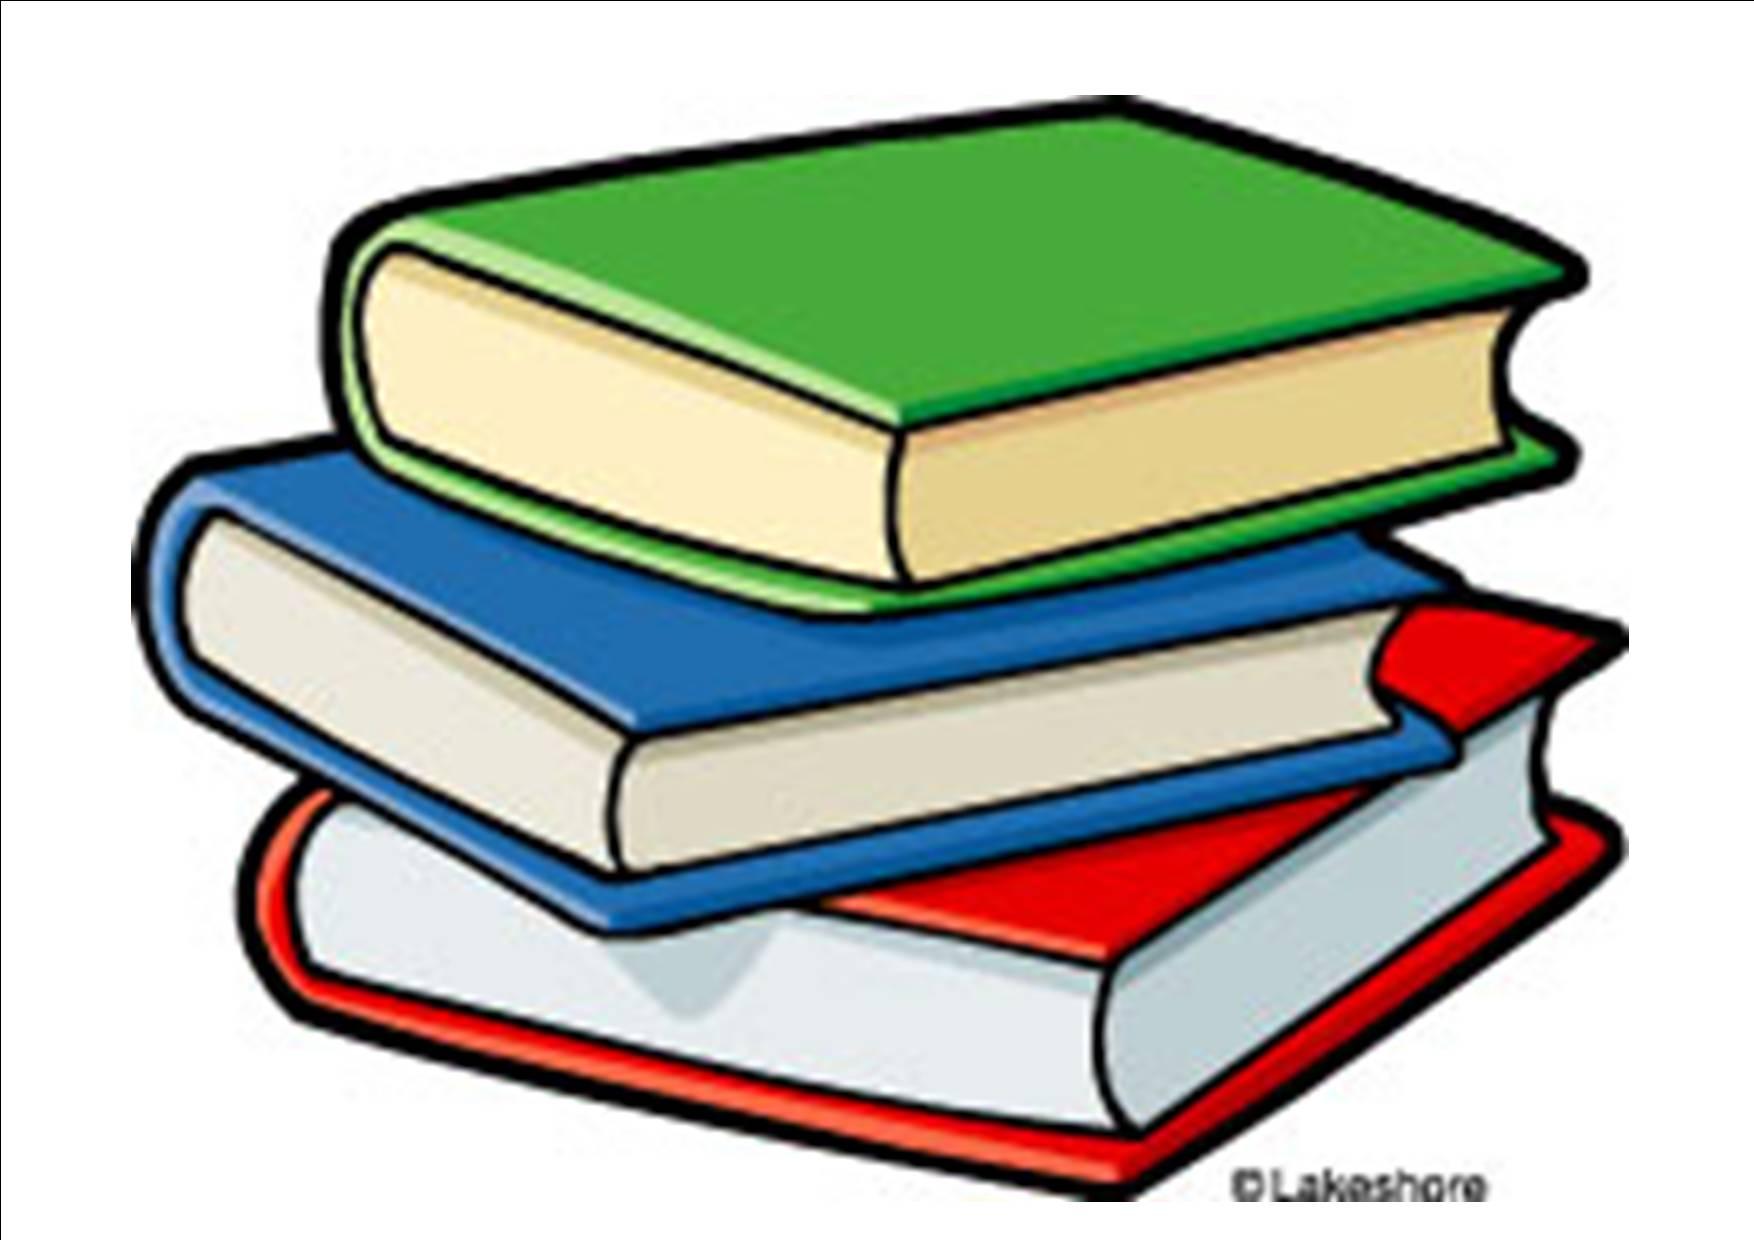 Book Clipart-book clipart-2